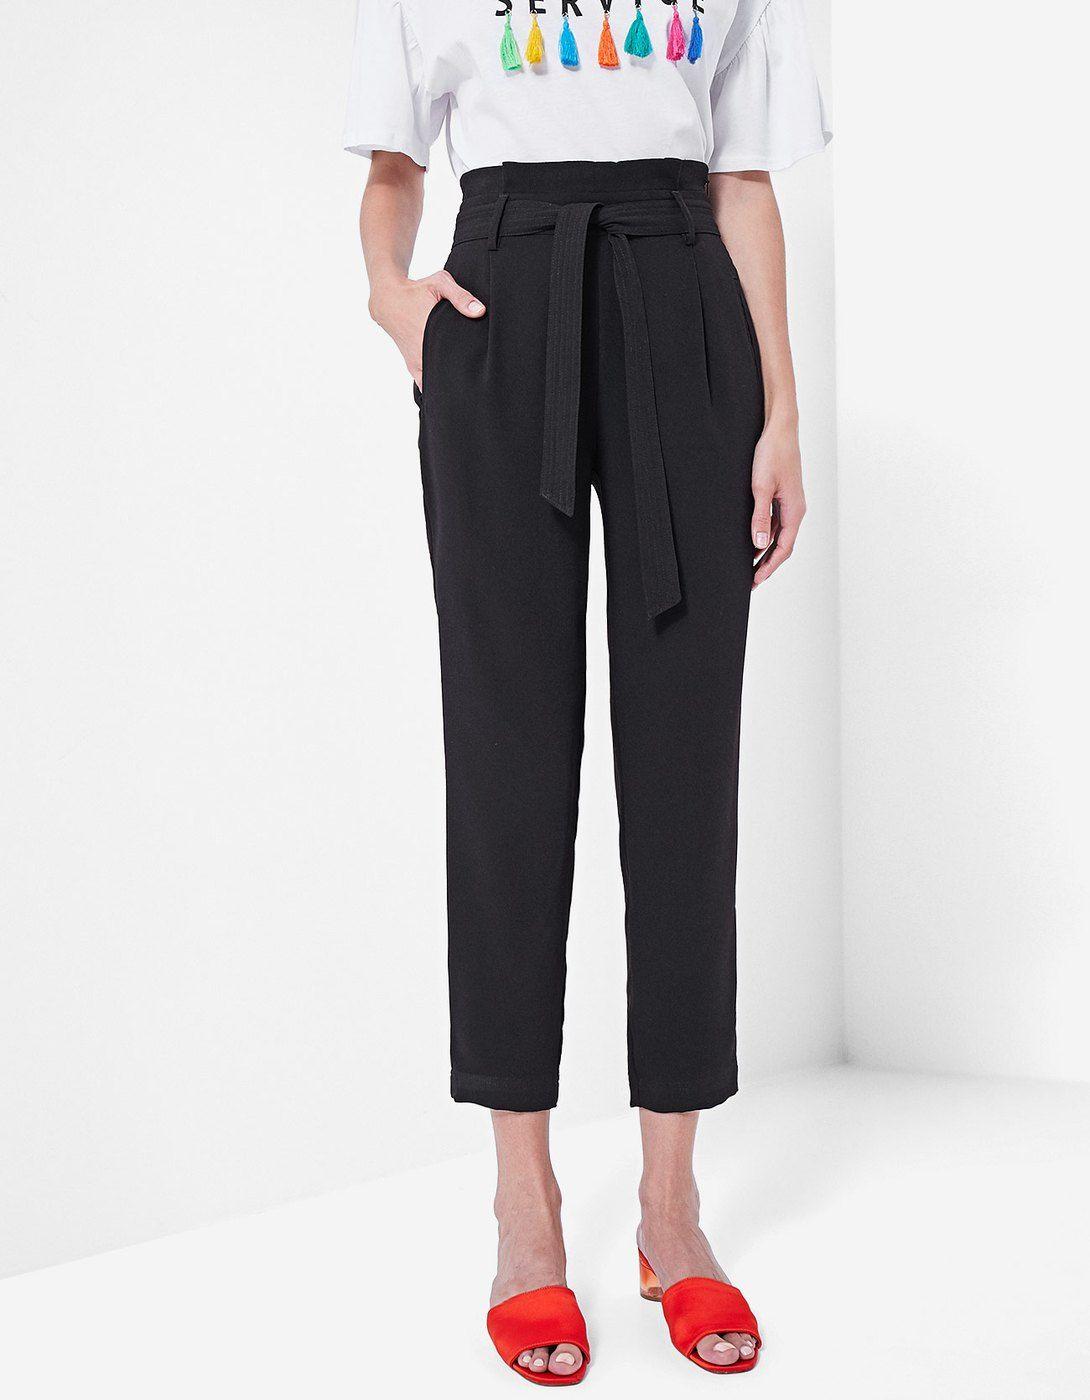 Pantalón paperbag fluido - Pantalones  ad58ddc8435e